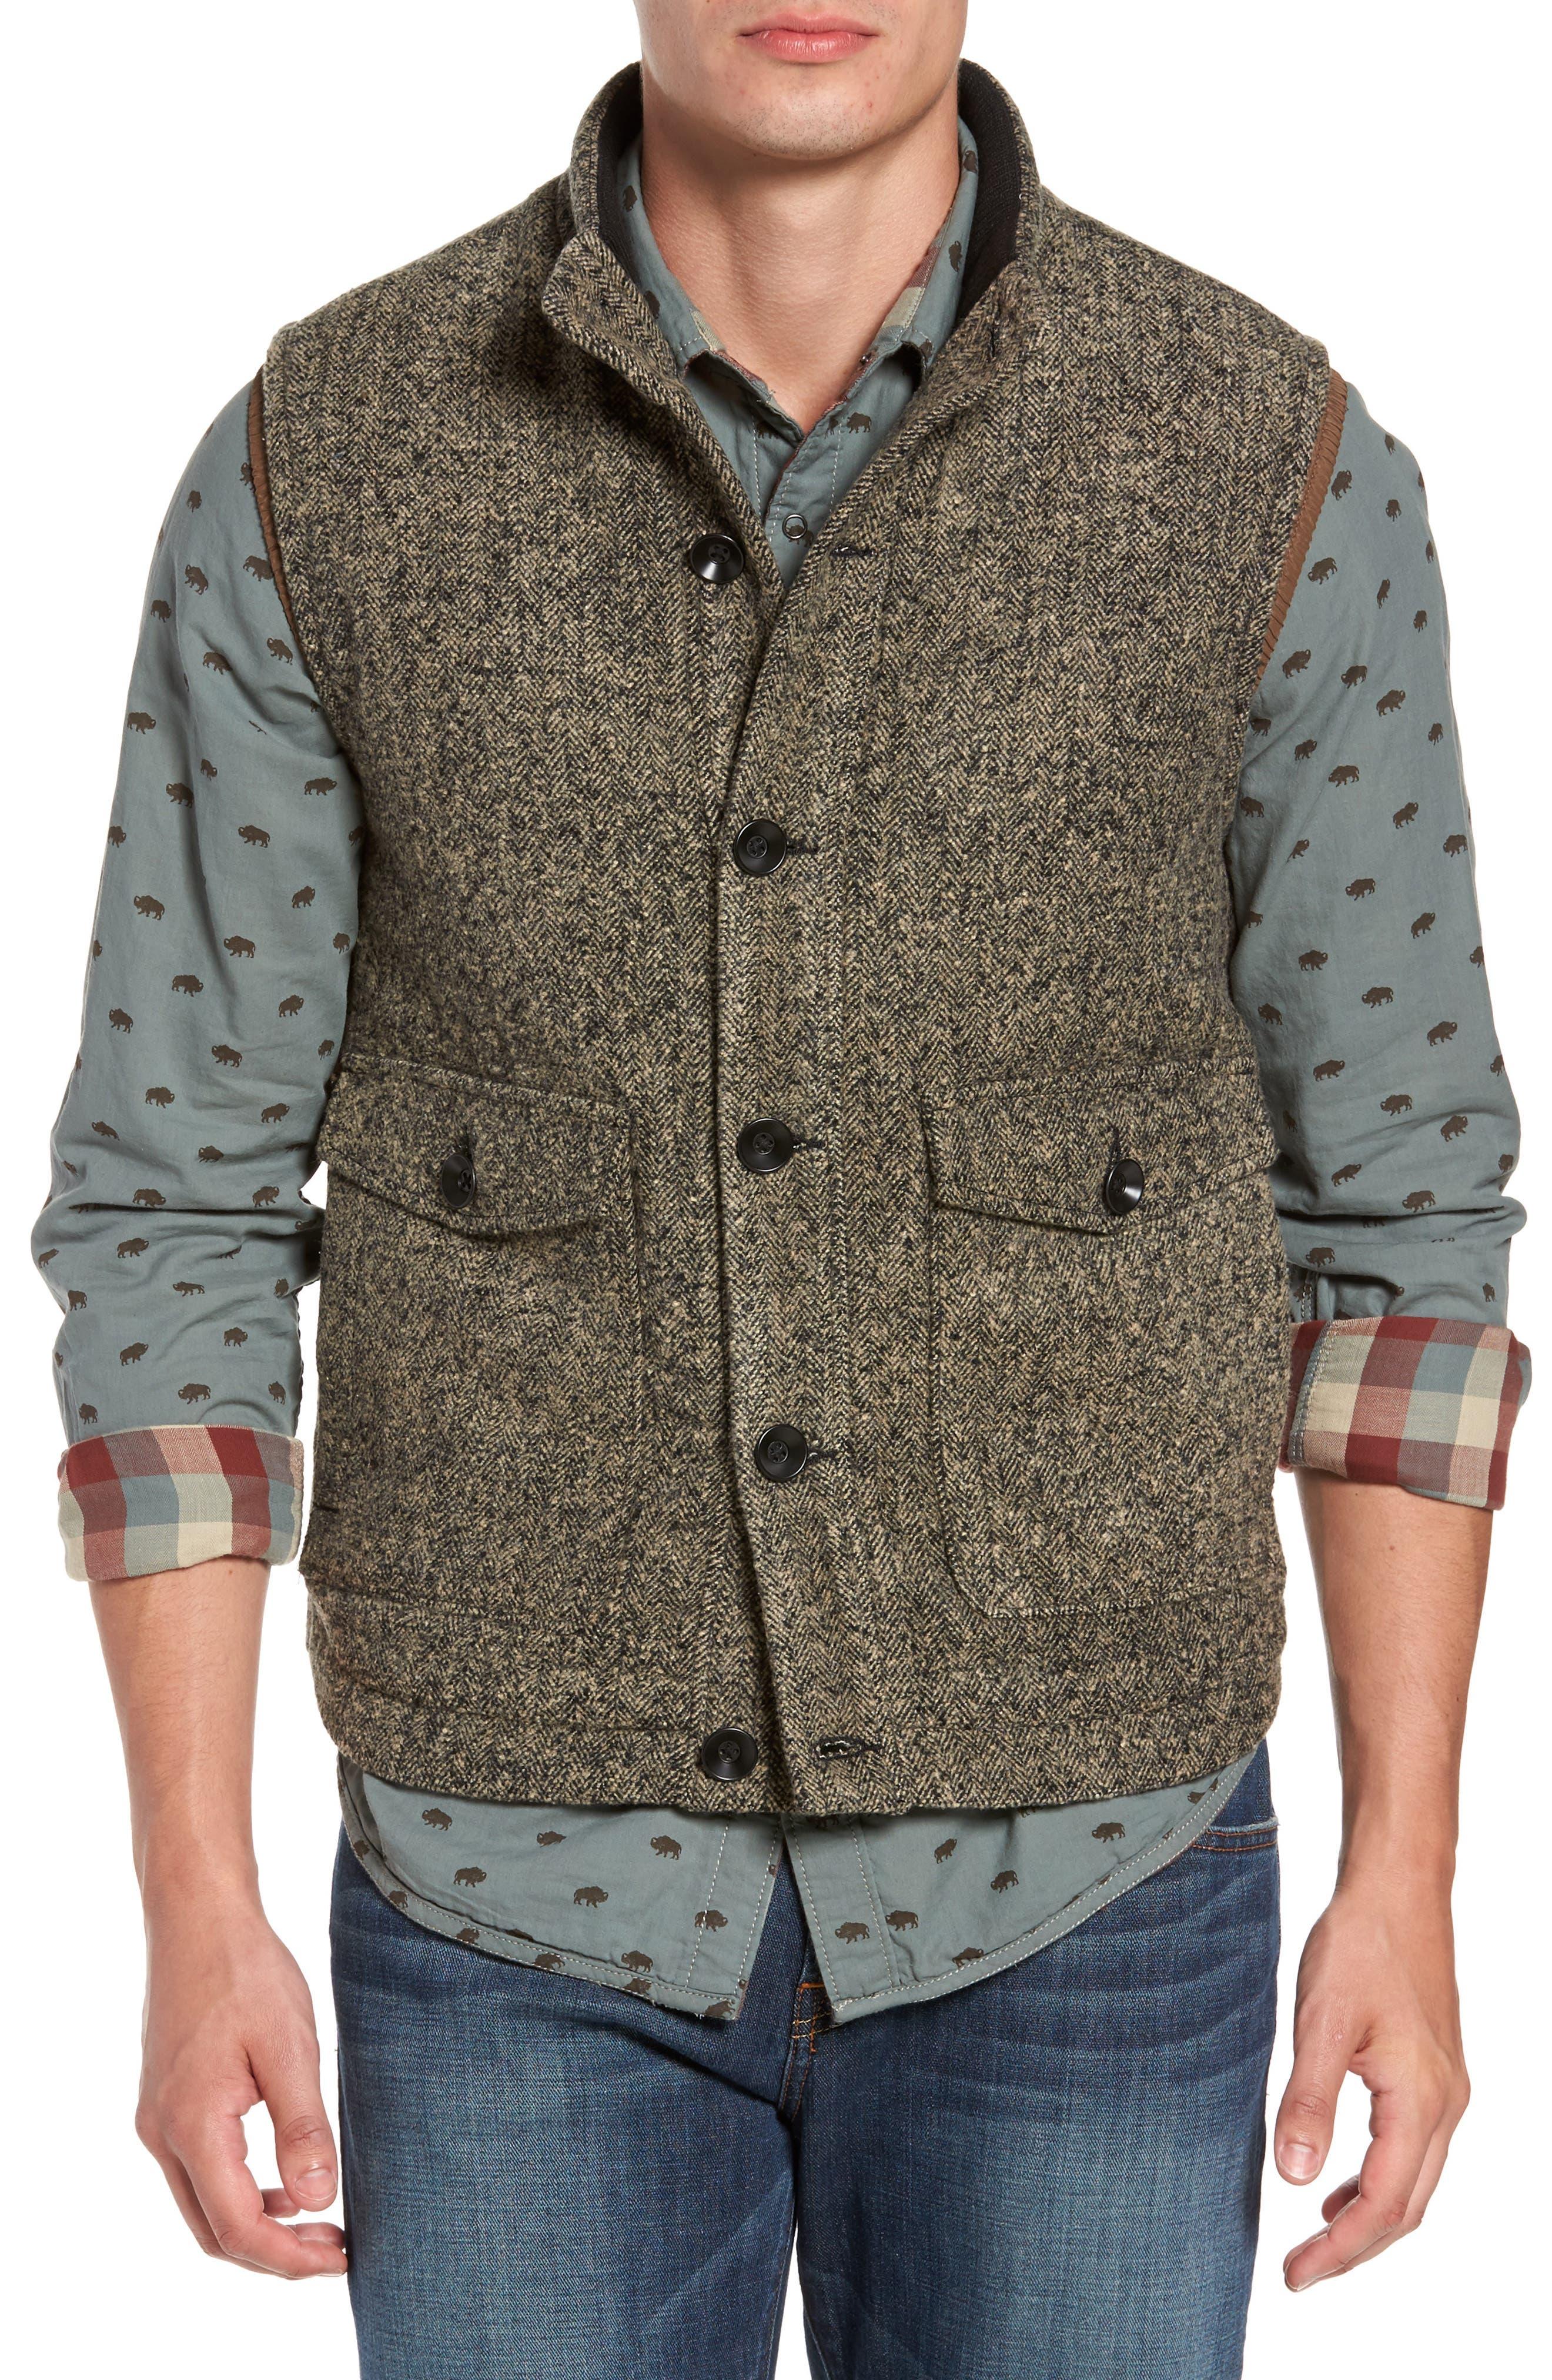 Alternate Image 1 Selected - Jeremiah Sanford Herringbone Vest